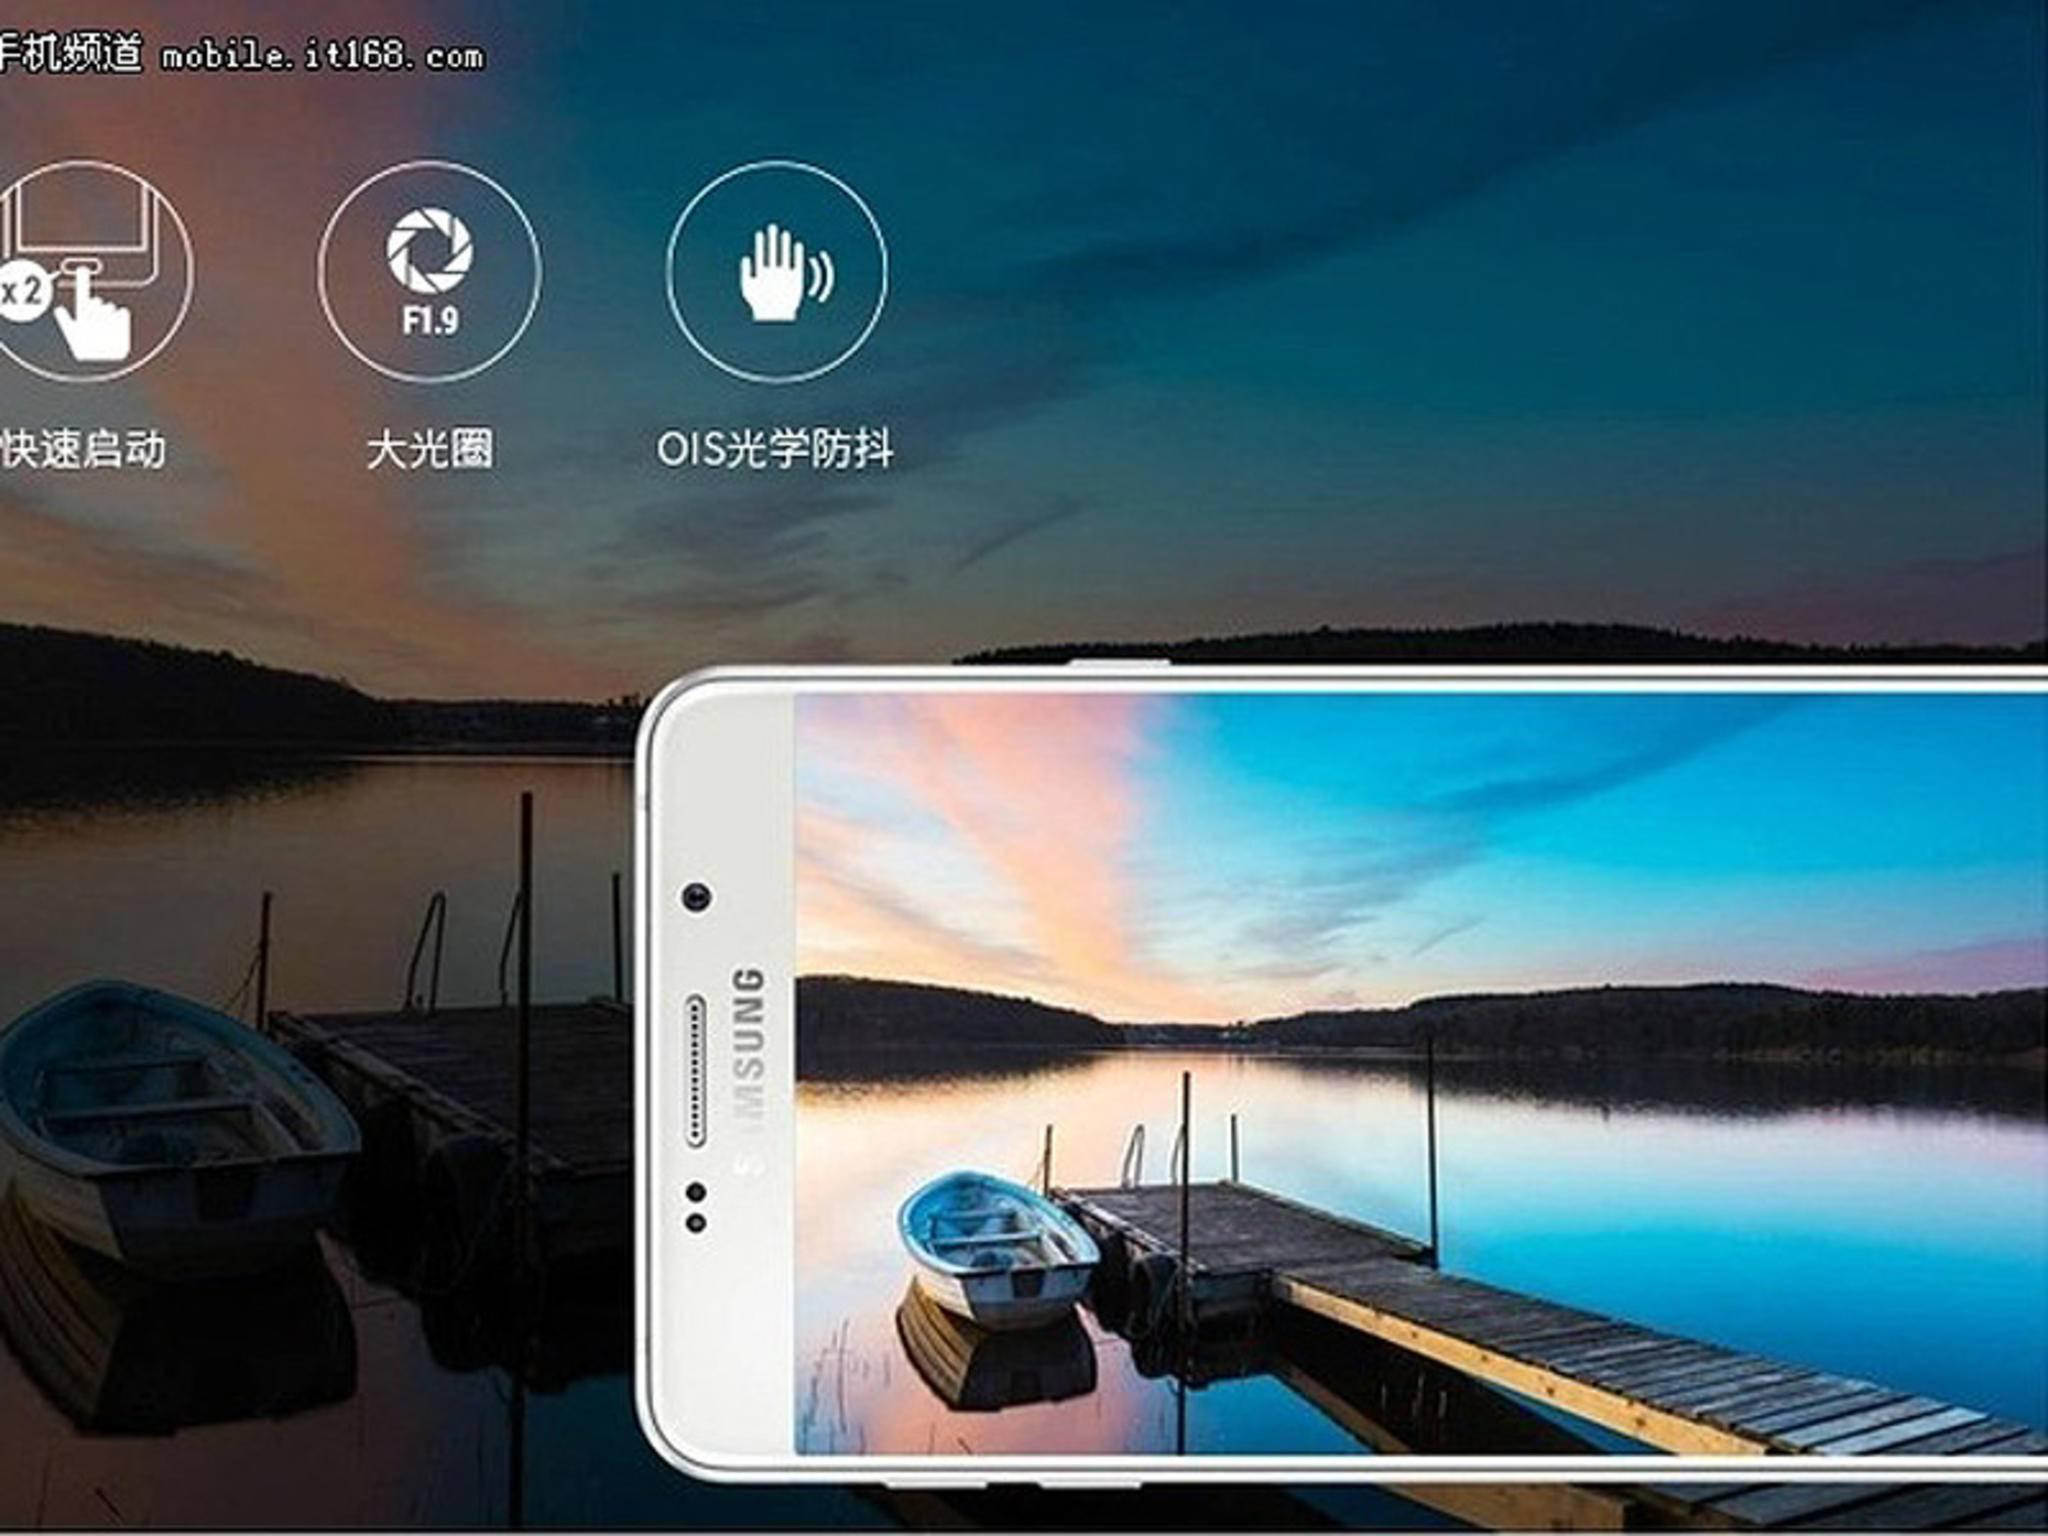 Das Galaxy A9 soll einen 4000-mAh-Akku haben.